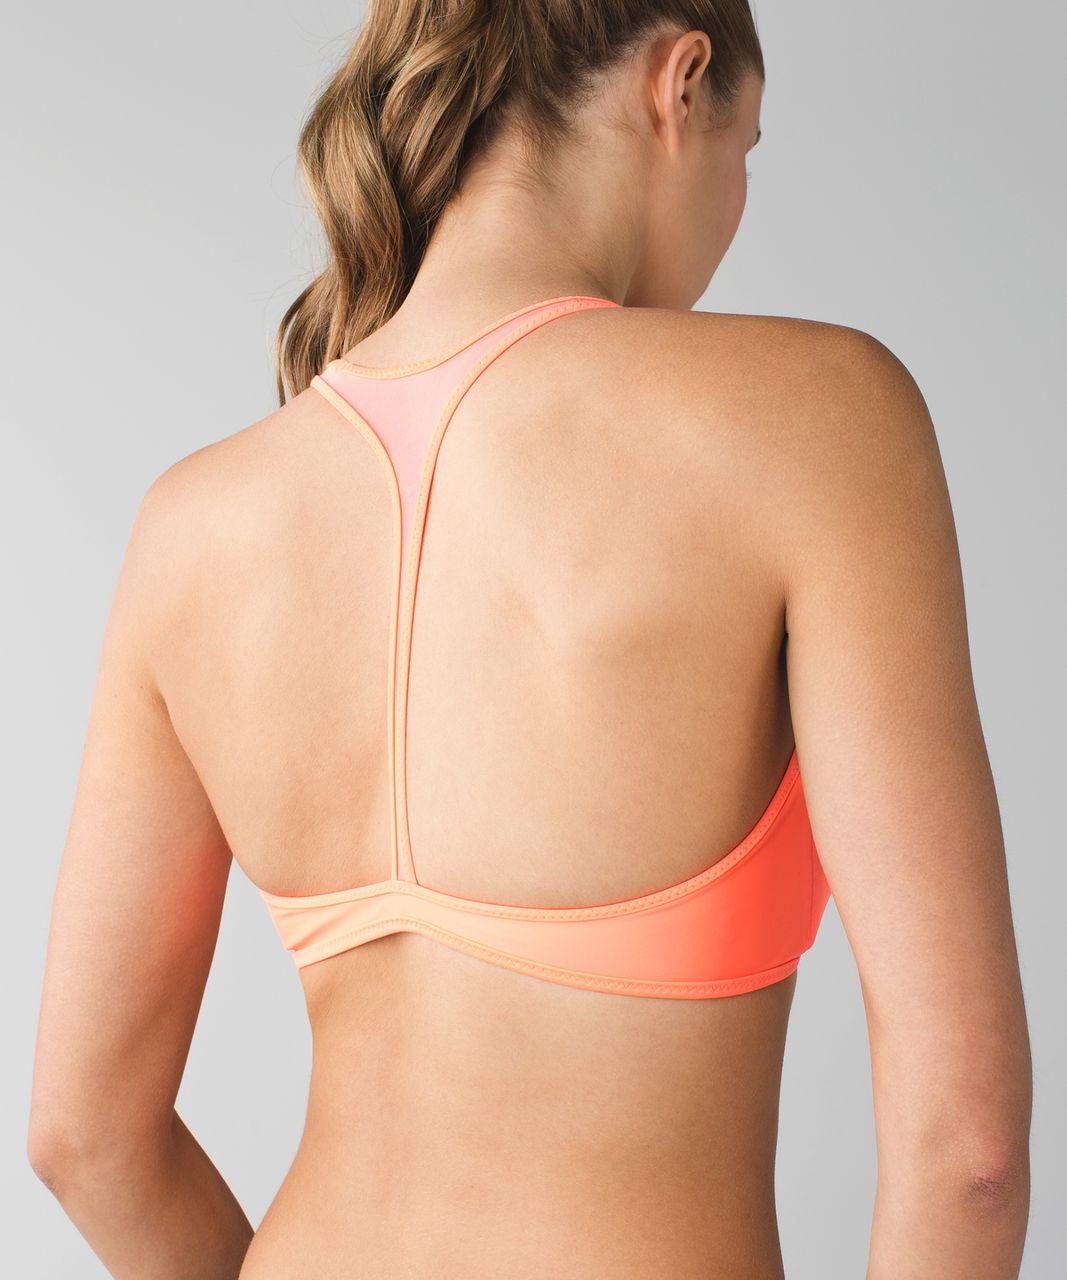 Lululemon Water:  Salty Swim Sport Top - Grapefruit / Mini Oki Heathered Print Silver Spoon Slate